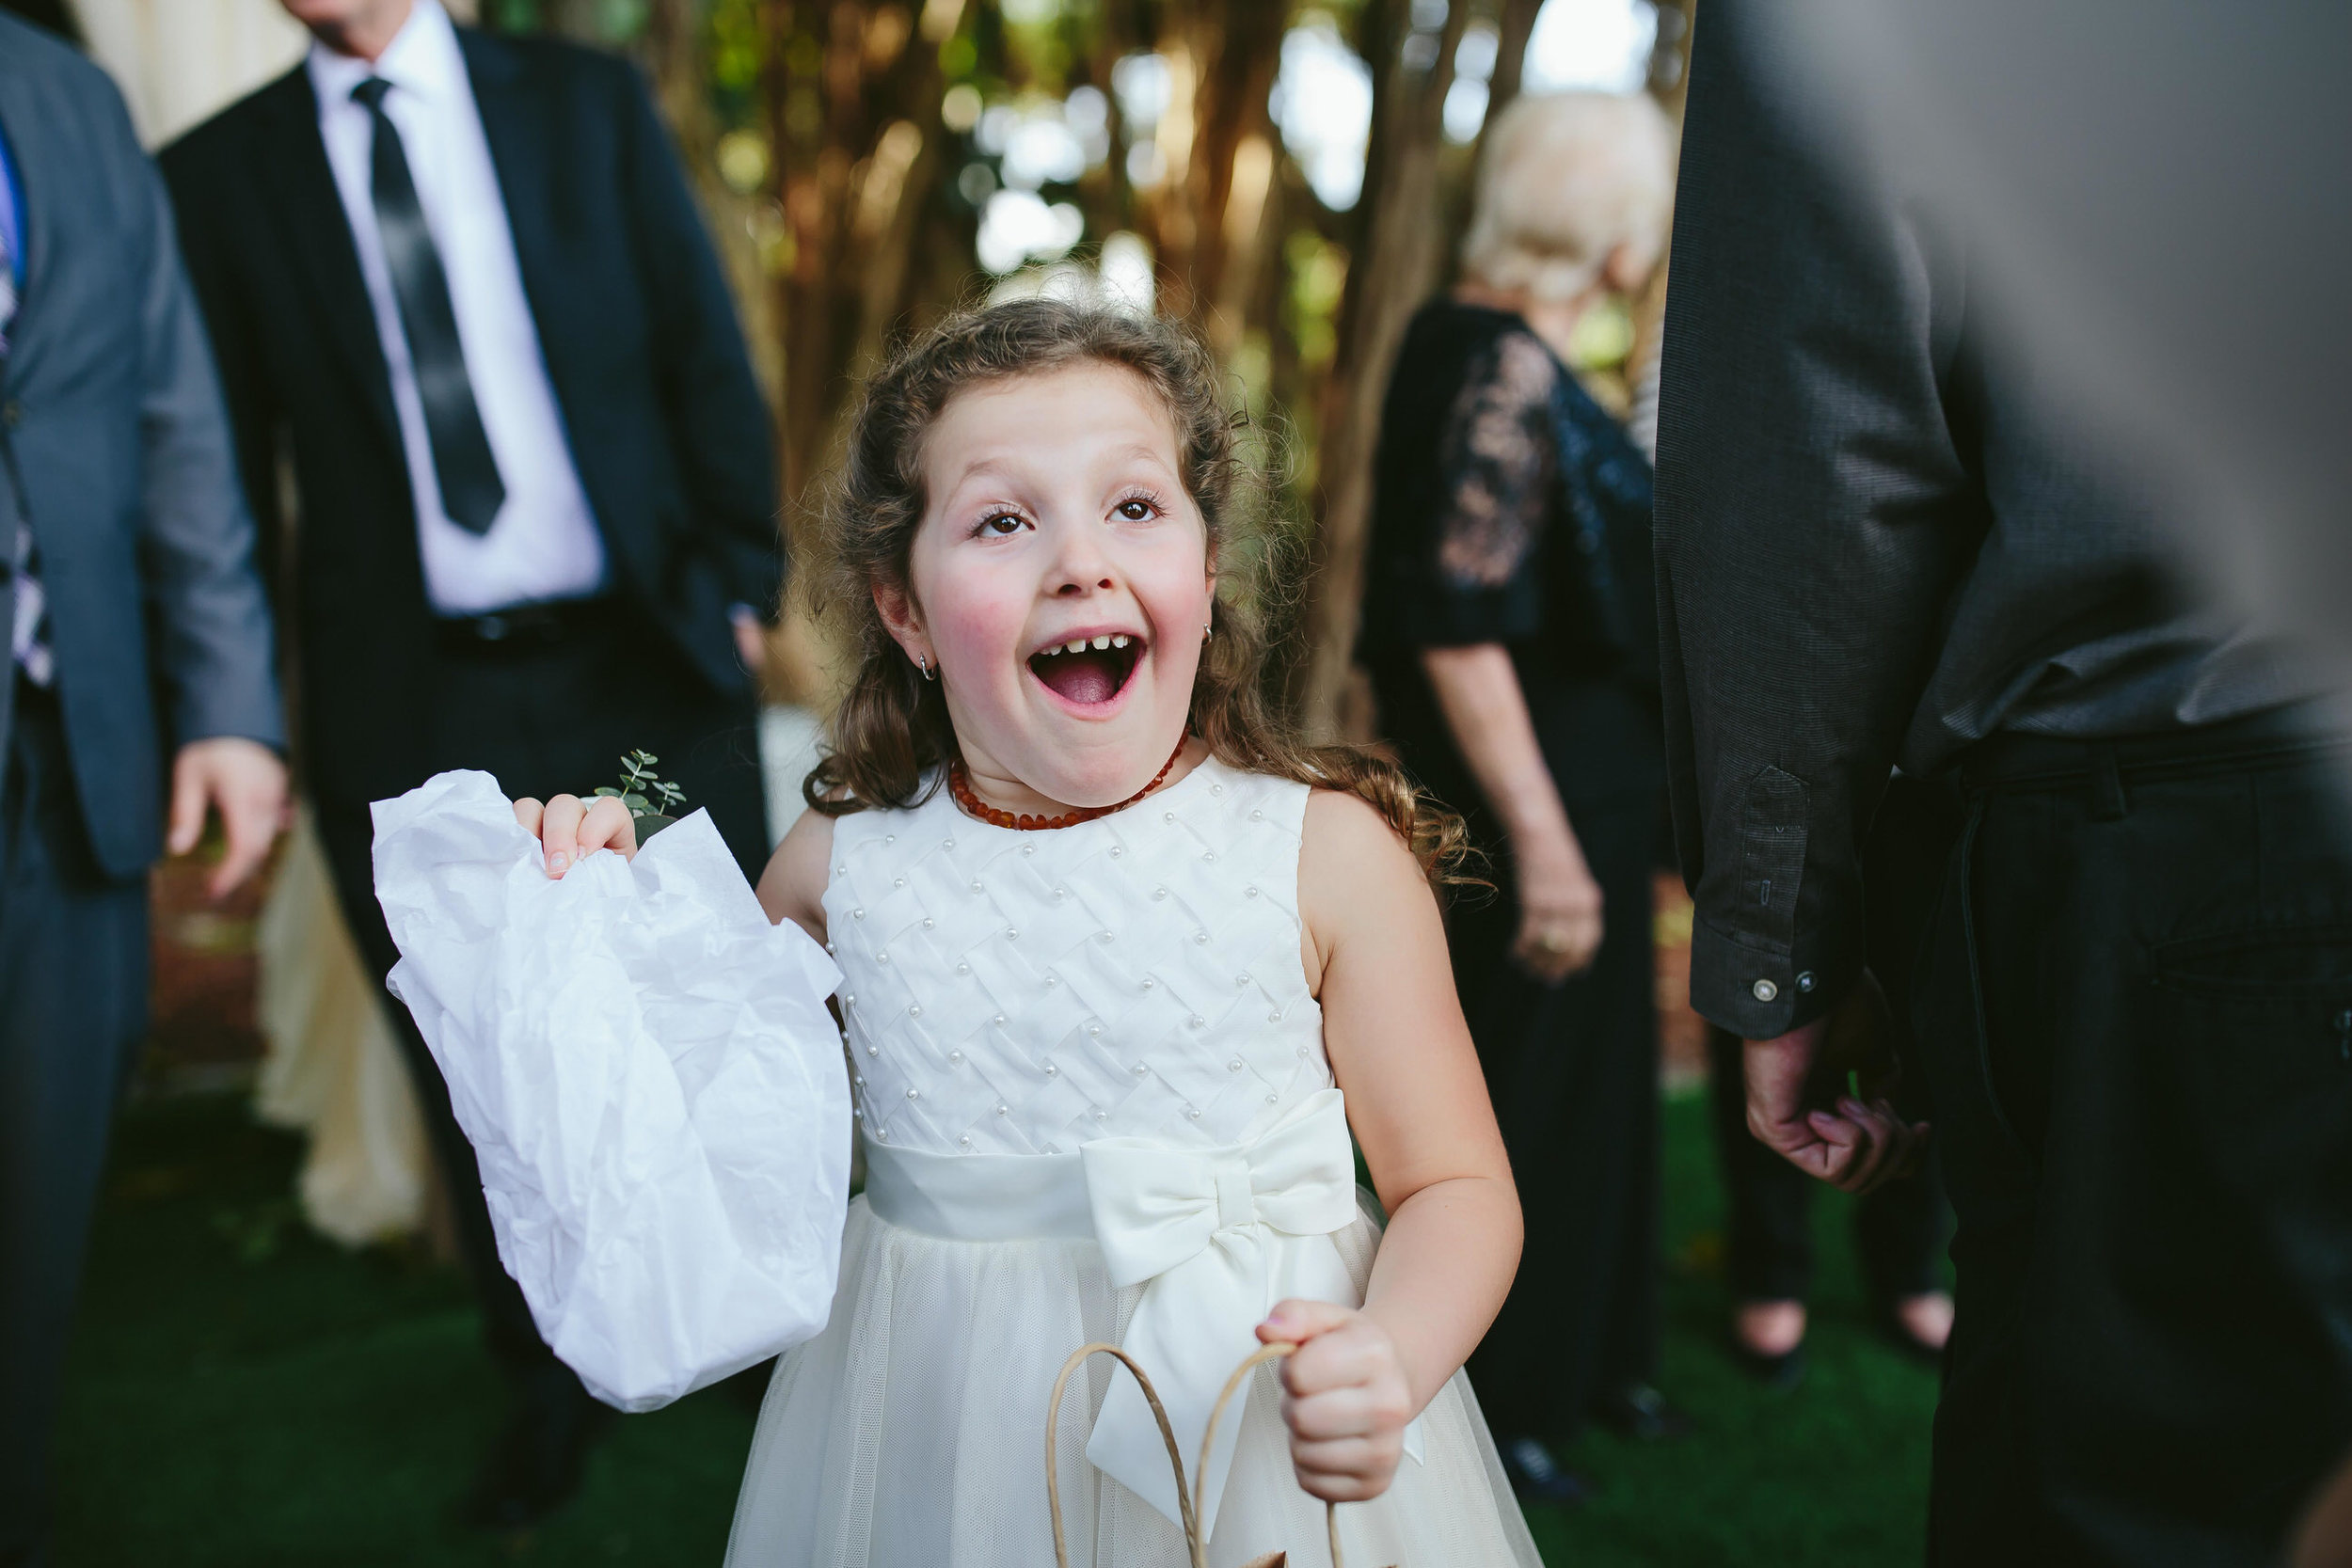 flower-girl-amazing-tiny-house-photo-weddings.jpg